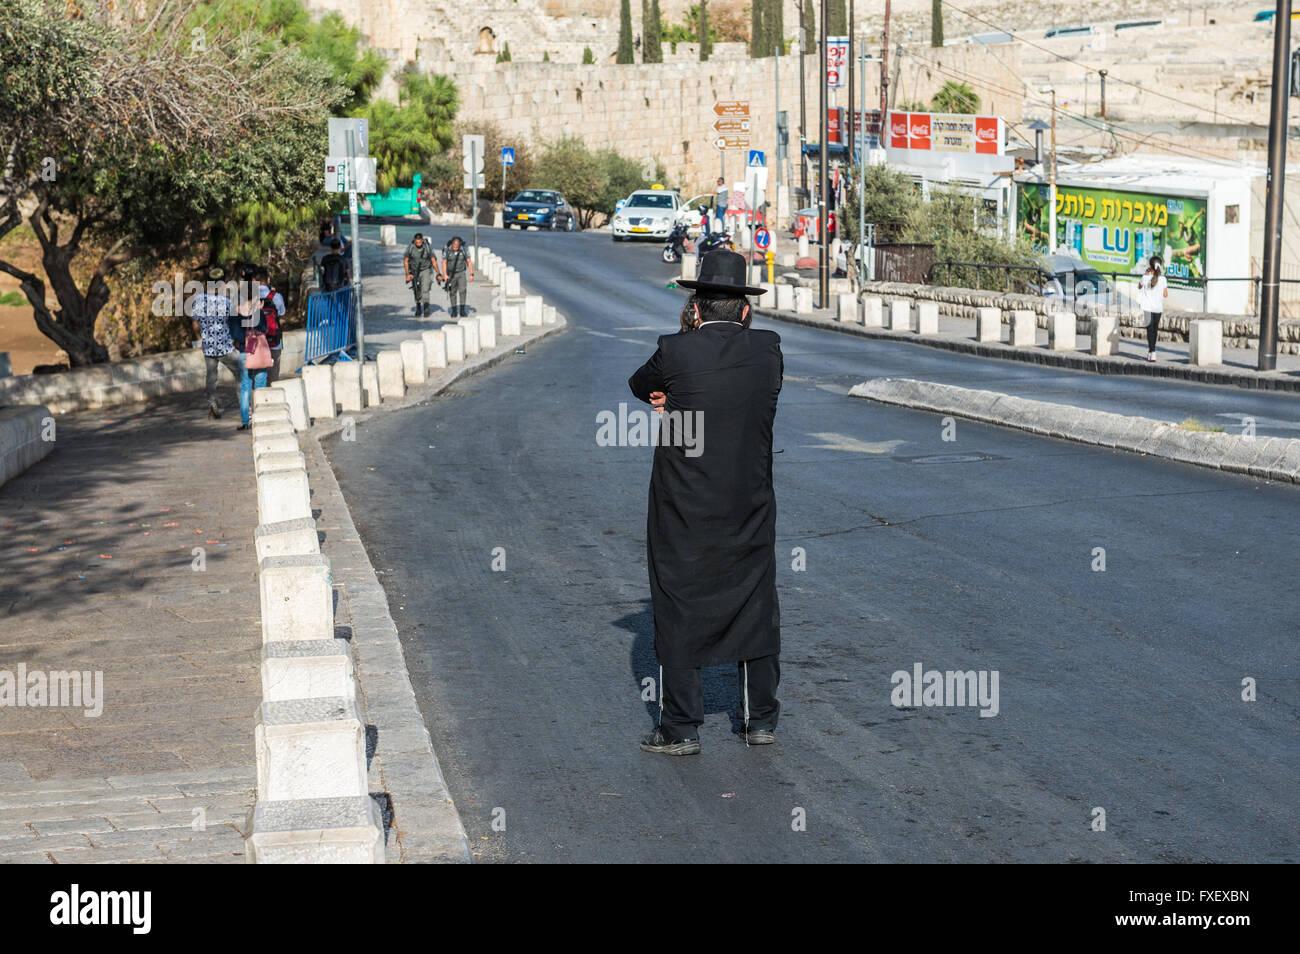 Orthodox Jew on Ma'ale HaShalom street called Pope's Road in Jerusalem, Israel - Stock Image